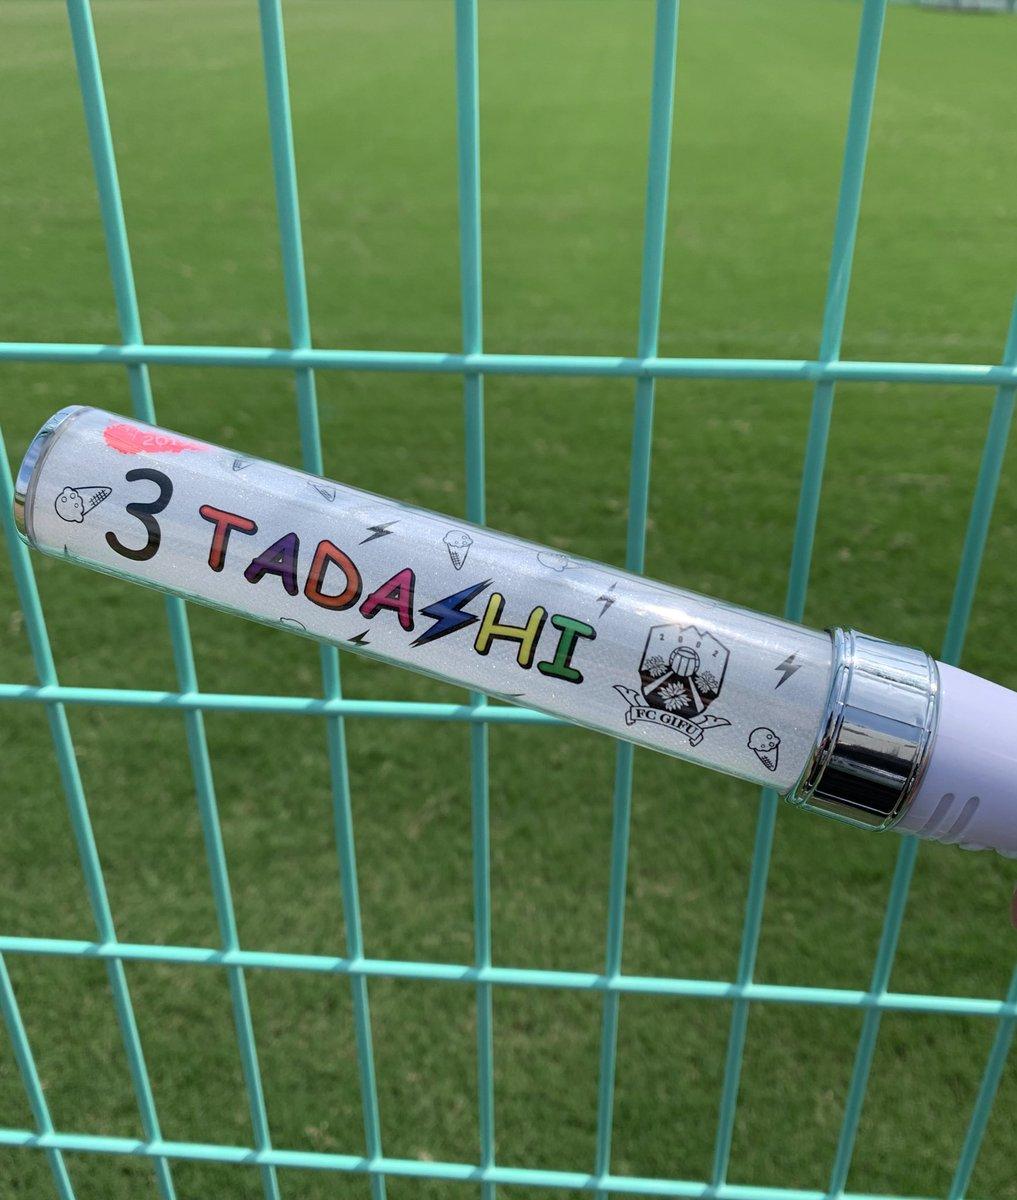 test ツイッターメディア - ペンライト発売中☺️ FC岐阜 TADASHIペンライトシート|【公式】Jリーグオンラインストア J.LEAGUE ONLINE STORE https://t.co/HnThlTAaIy https://t.co/XlmL2j6OGI